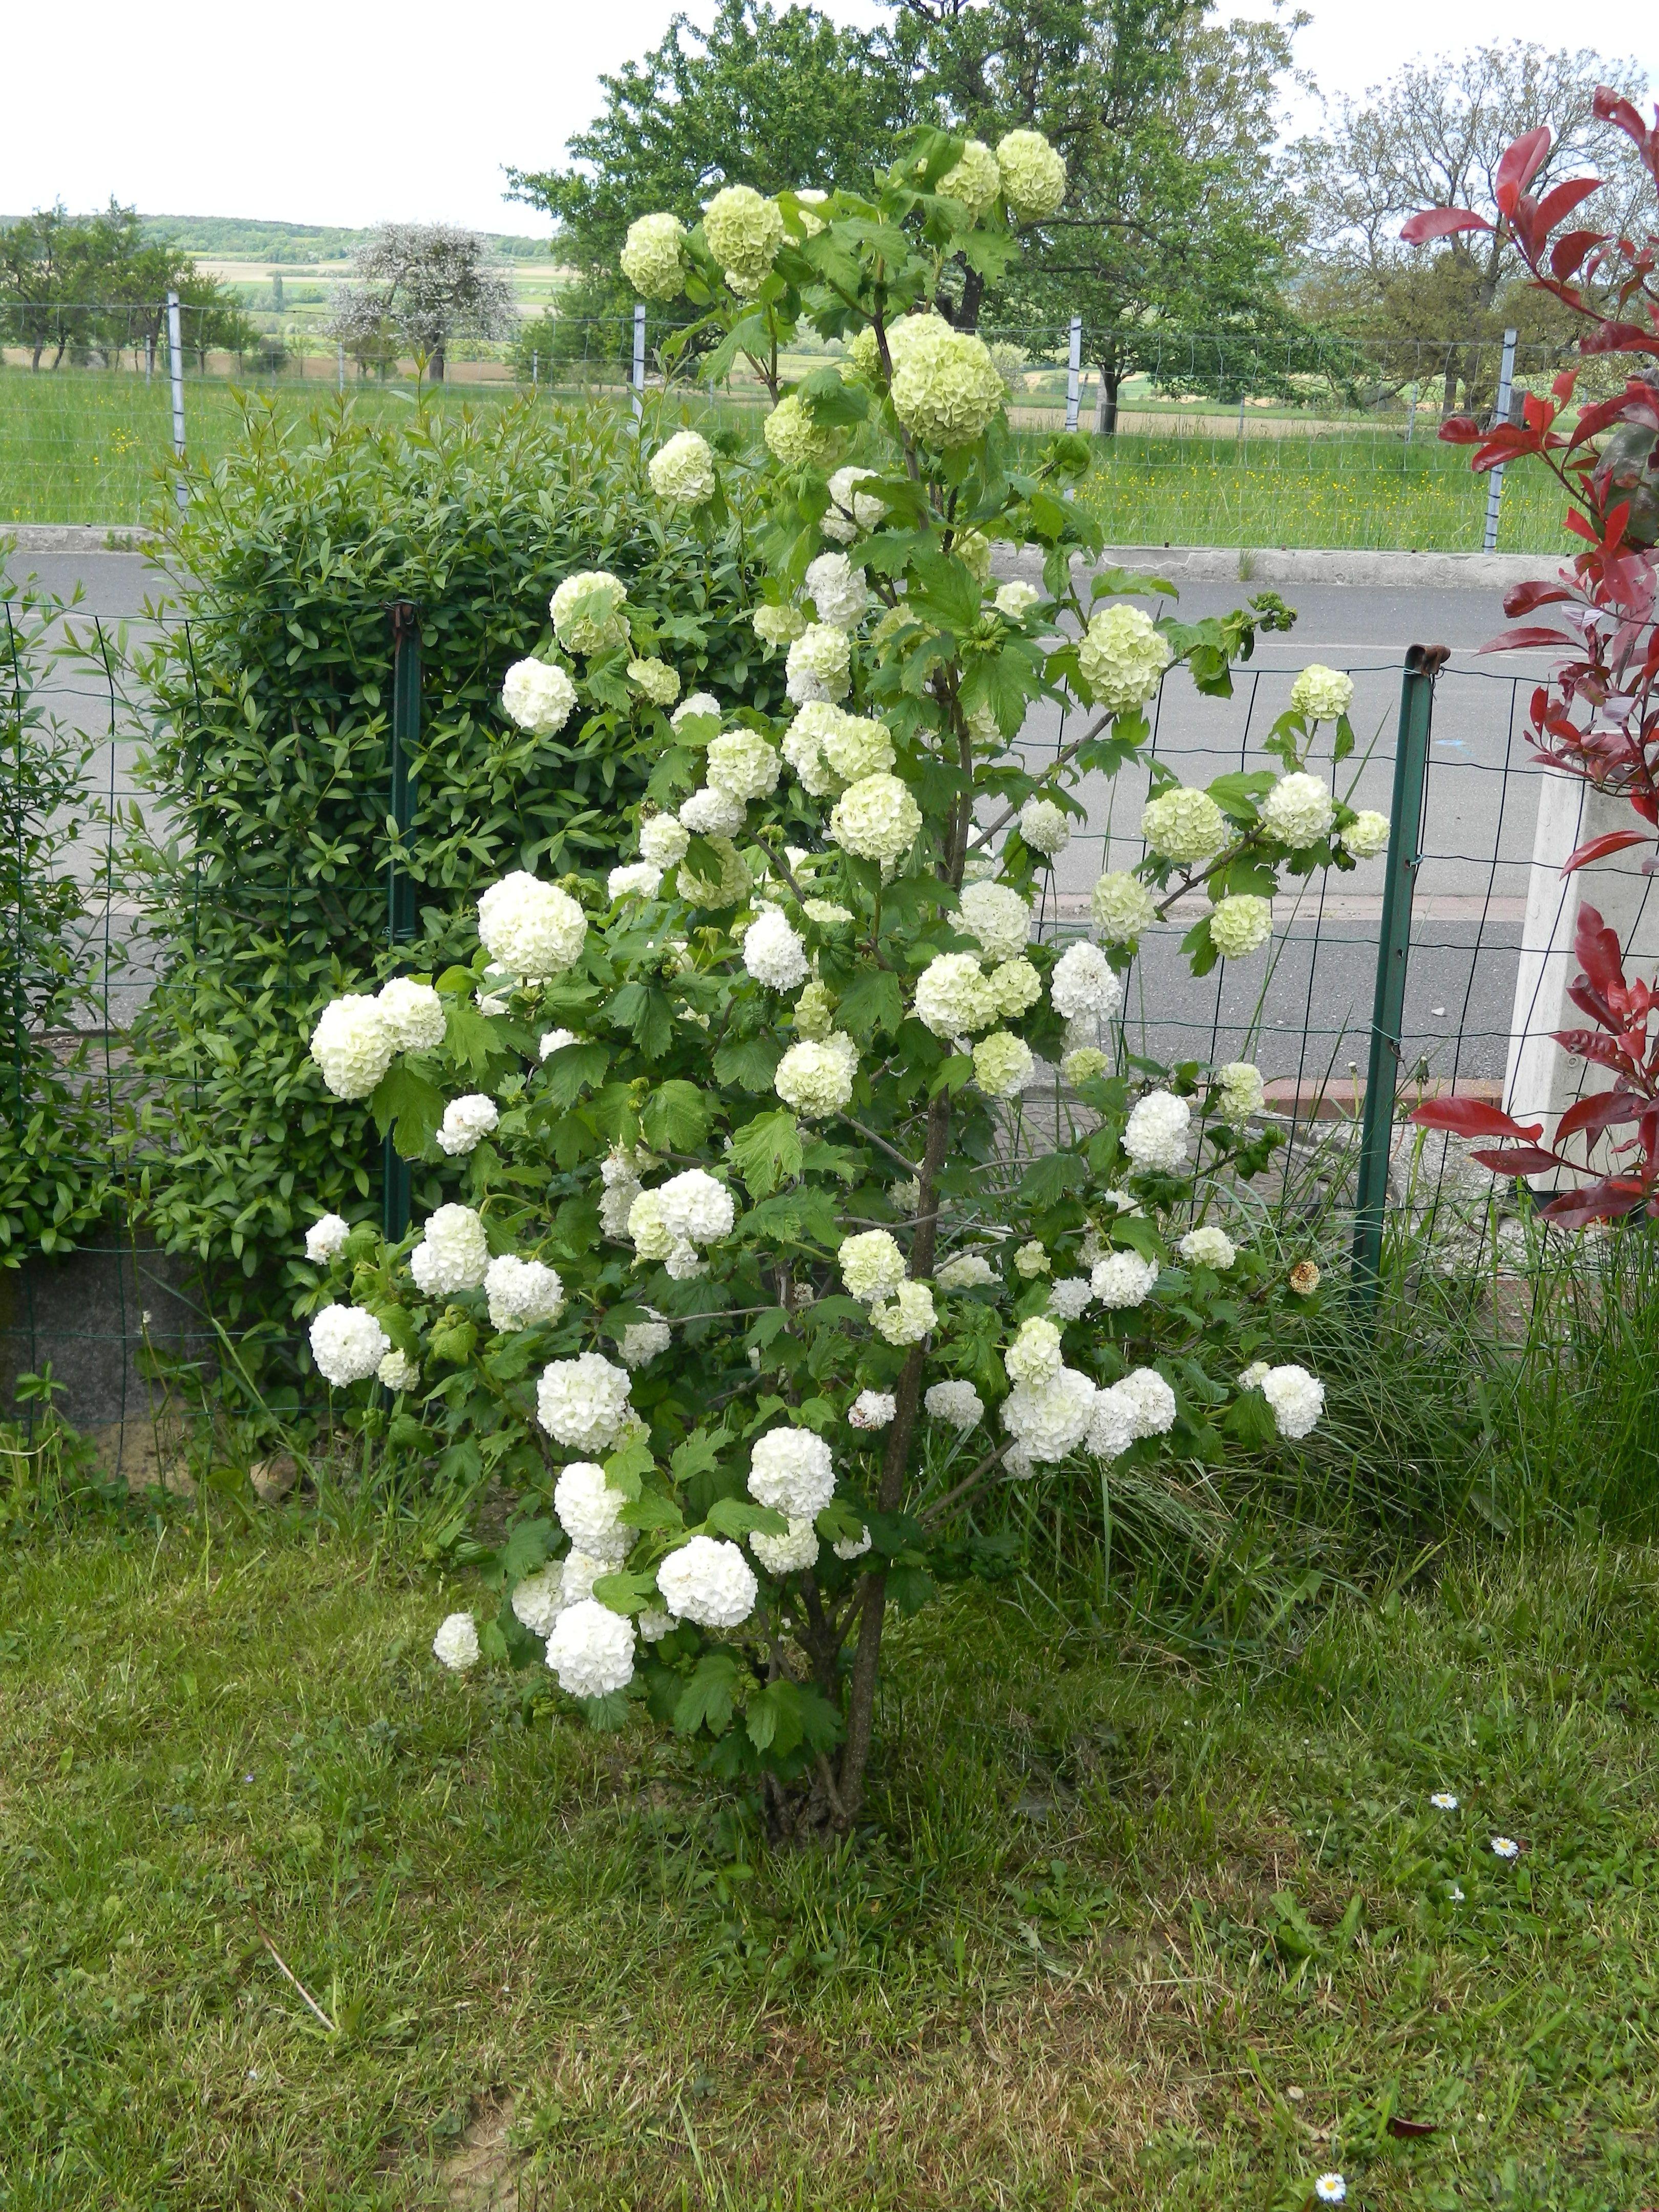 Arbuste Boule De Neige : arbuste, boule, neige, Arbuste,